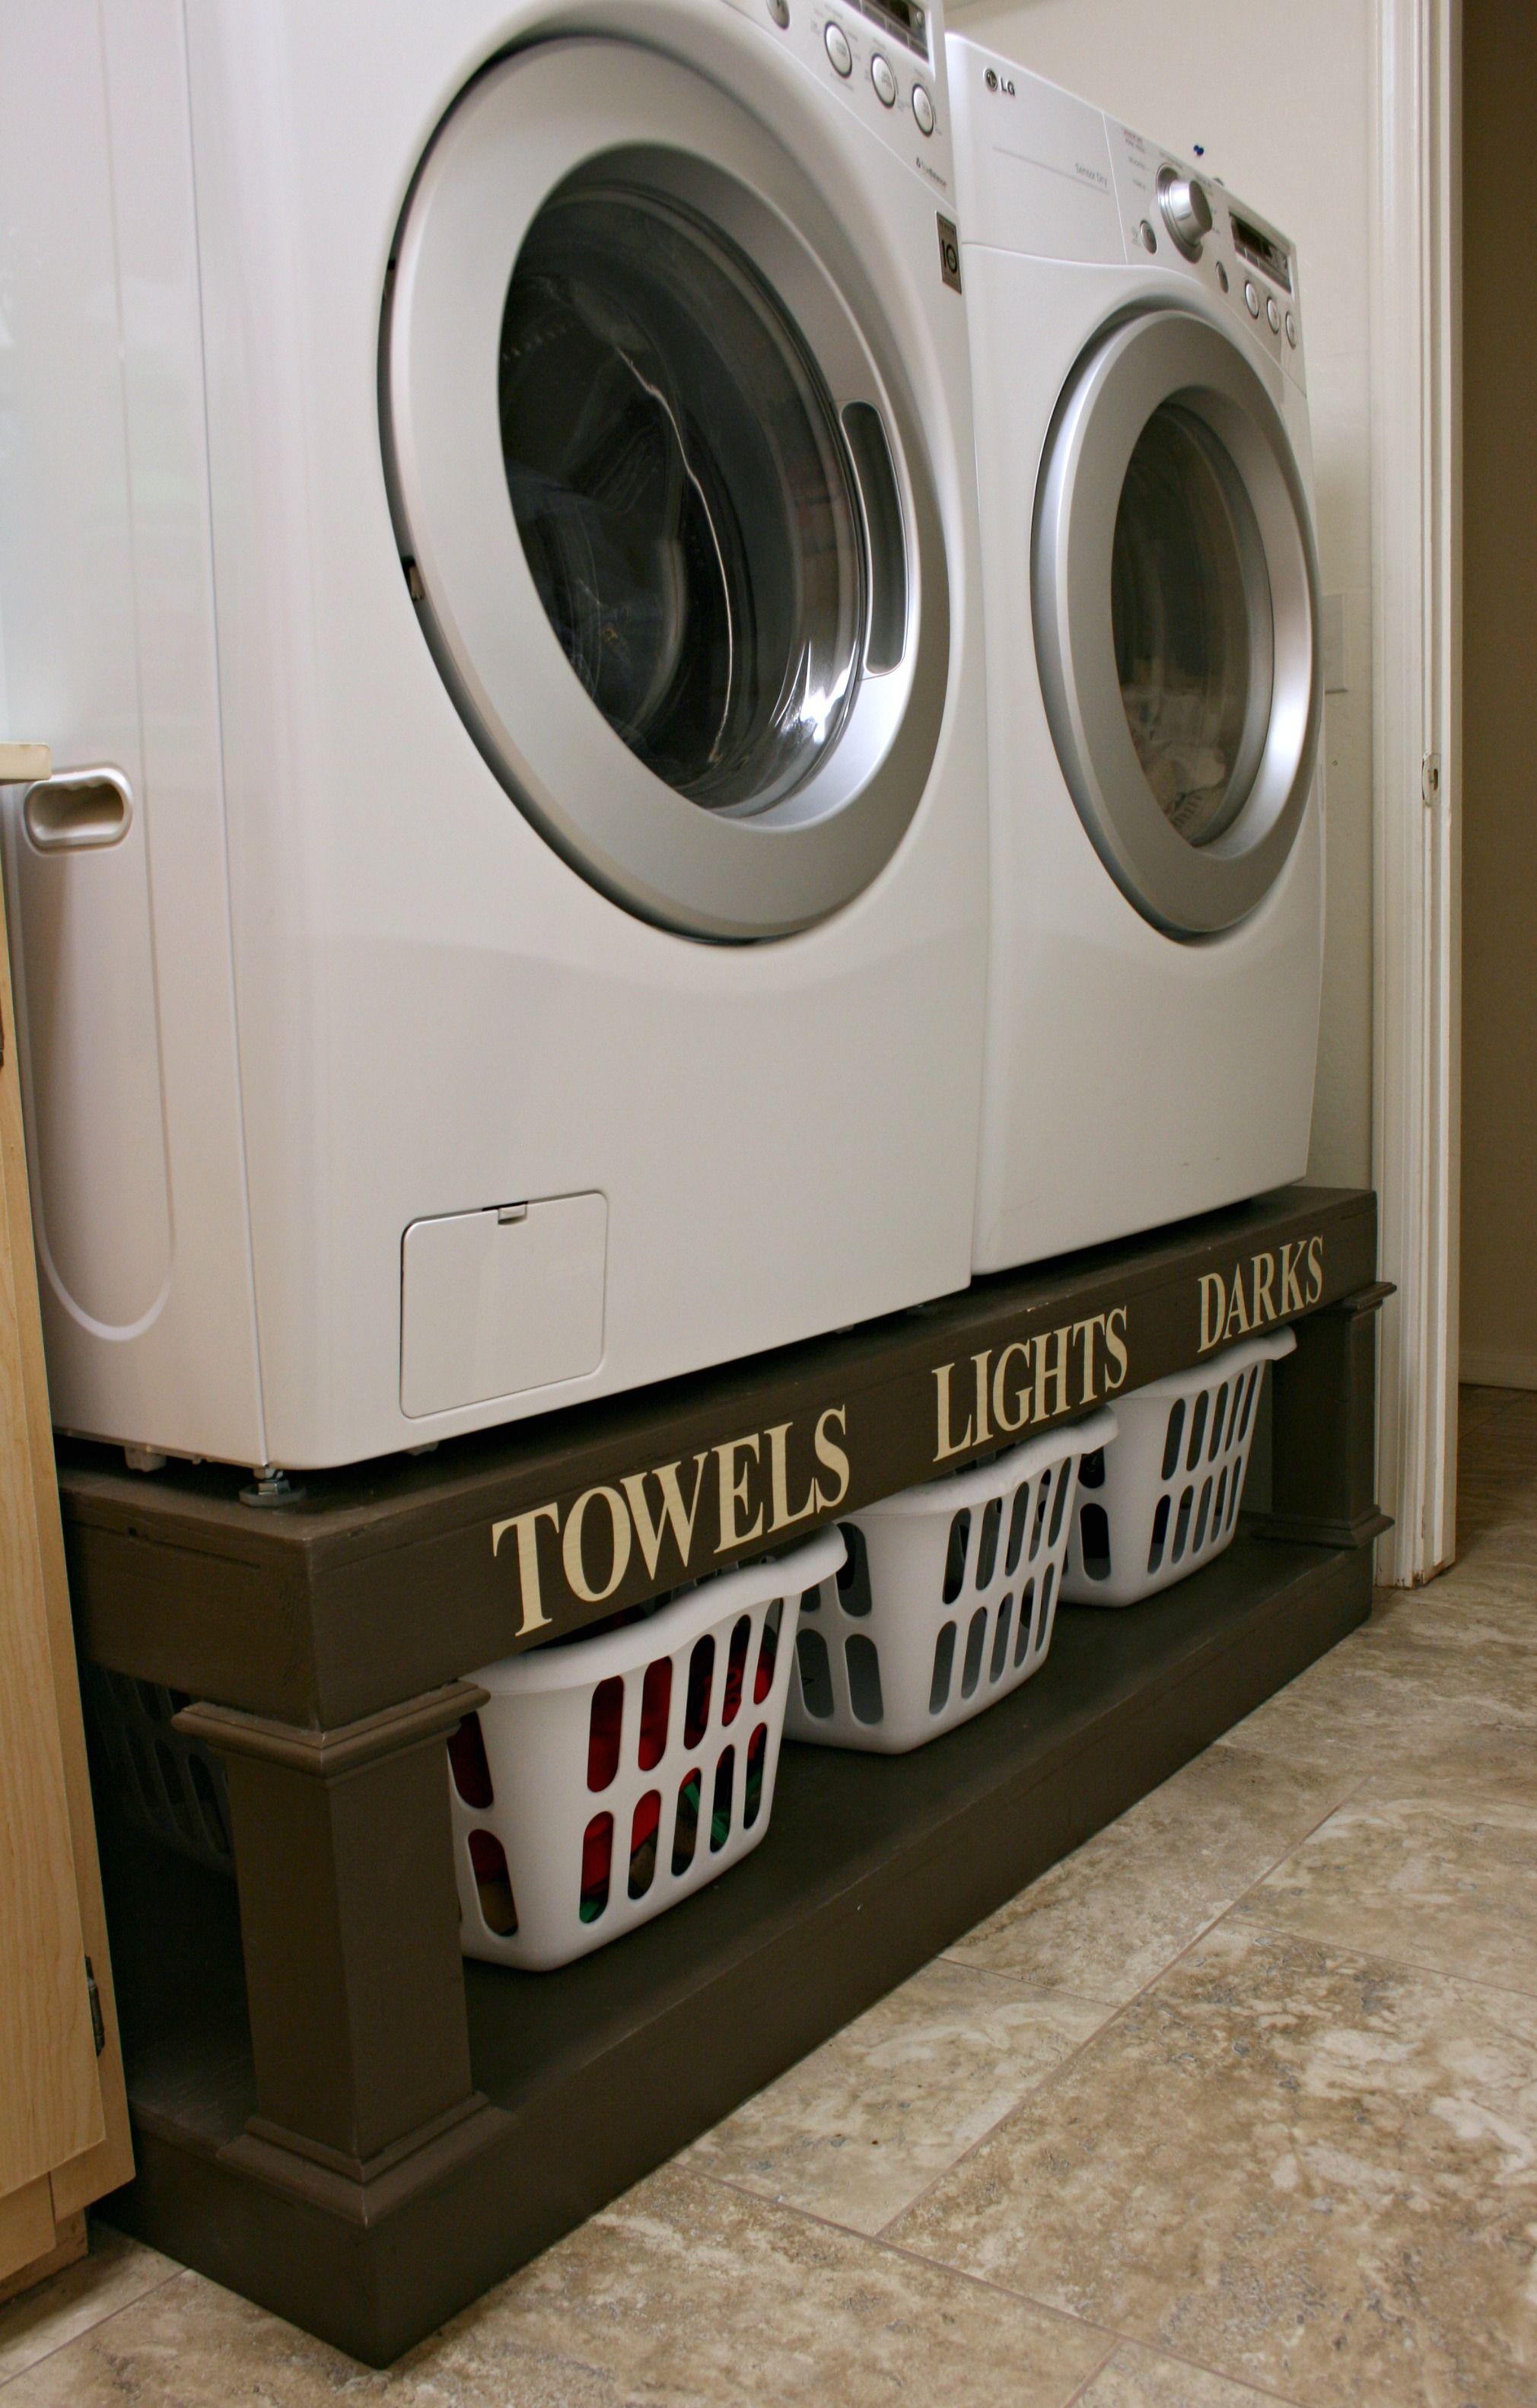 appliance dryer parts pedestal wid electrolux prod washer pedestals silver spin w hei p qlt laundry sands appliances drawer accessories